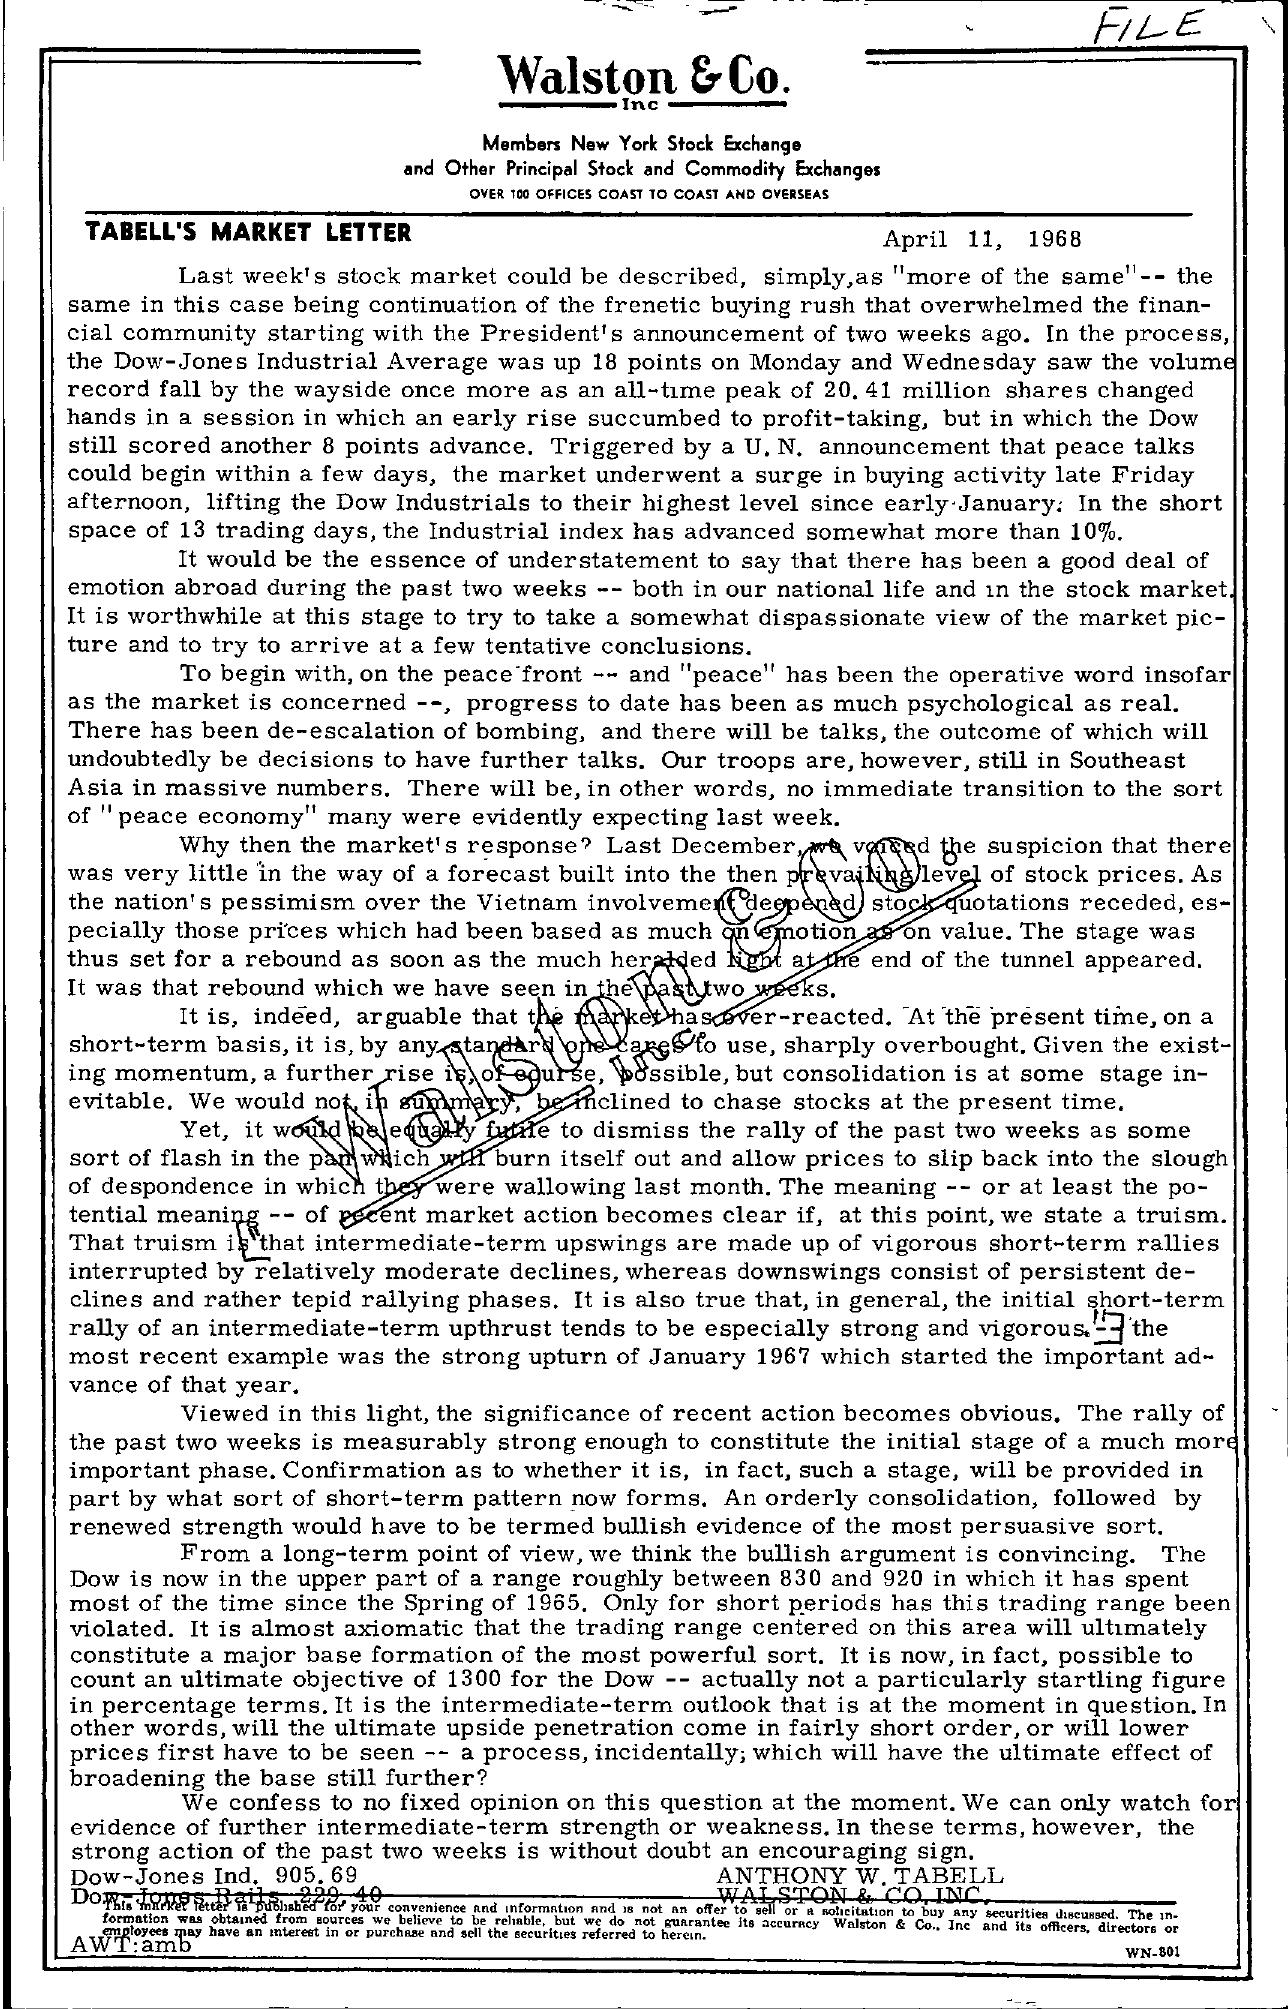 Tabell's Market Letter - April 11, 1968